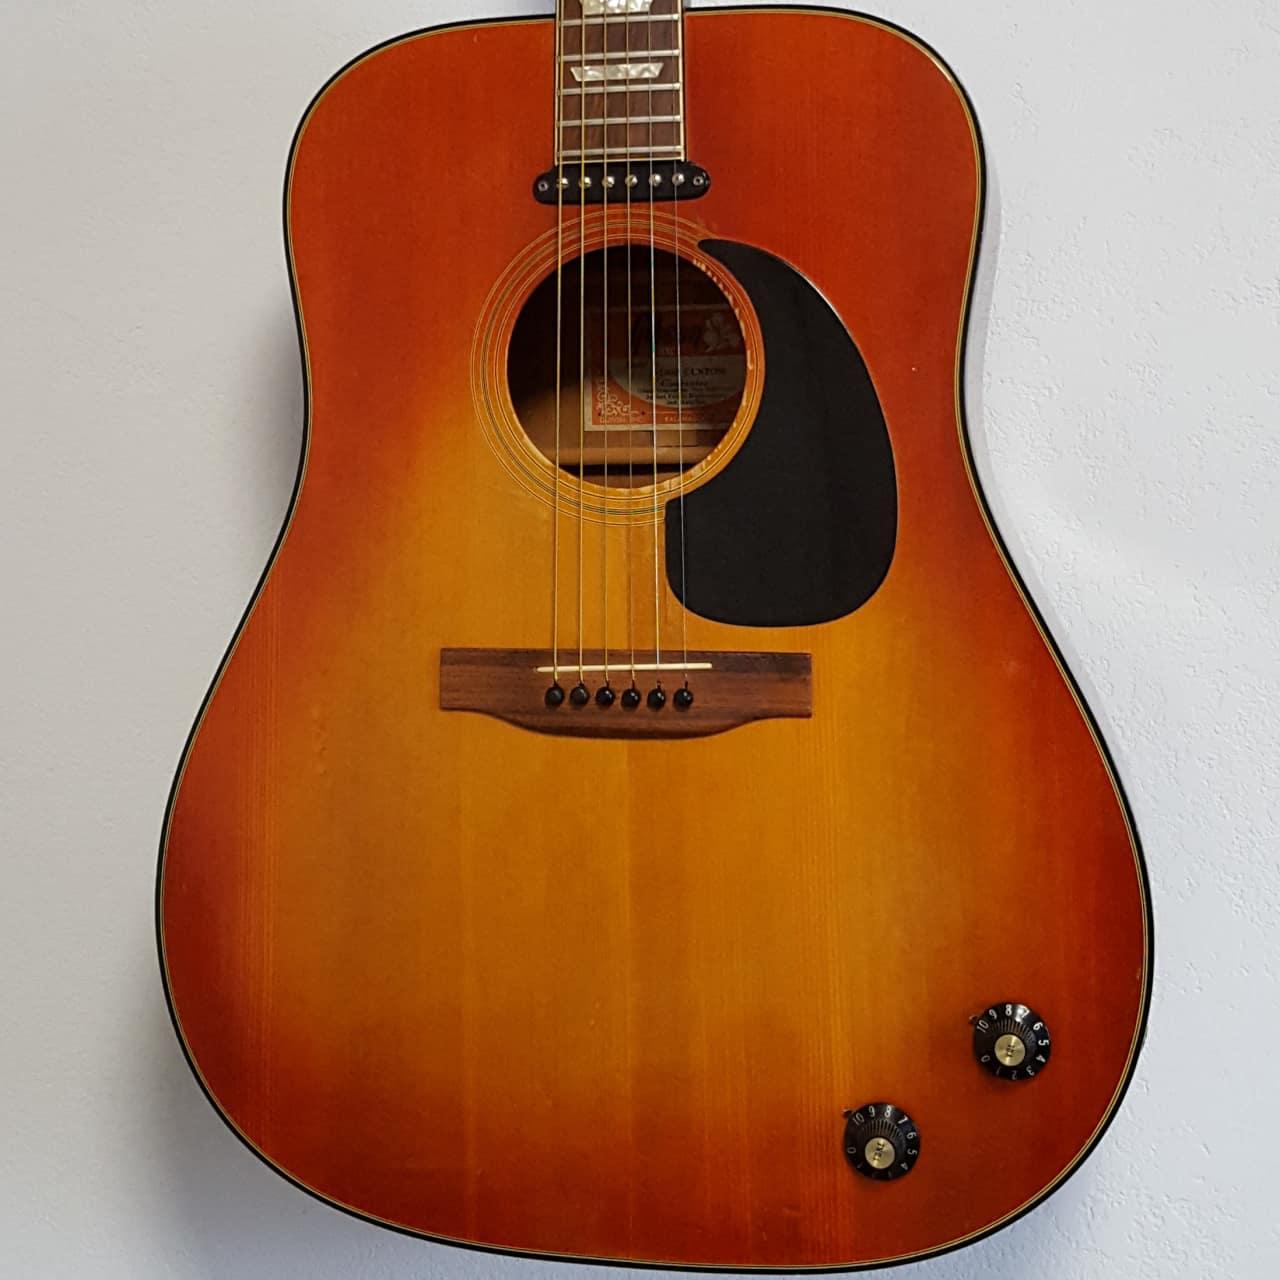 Progressive Near Me >> 1973 Gibson J-160E Custom Acoustic-Electric Guitar Vintage ...